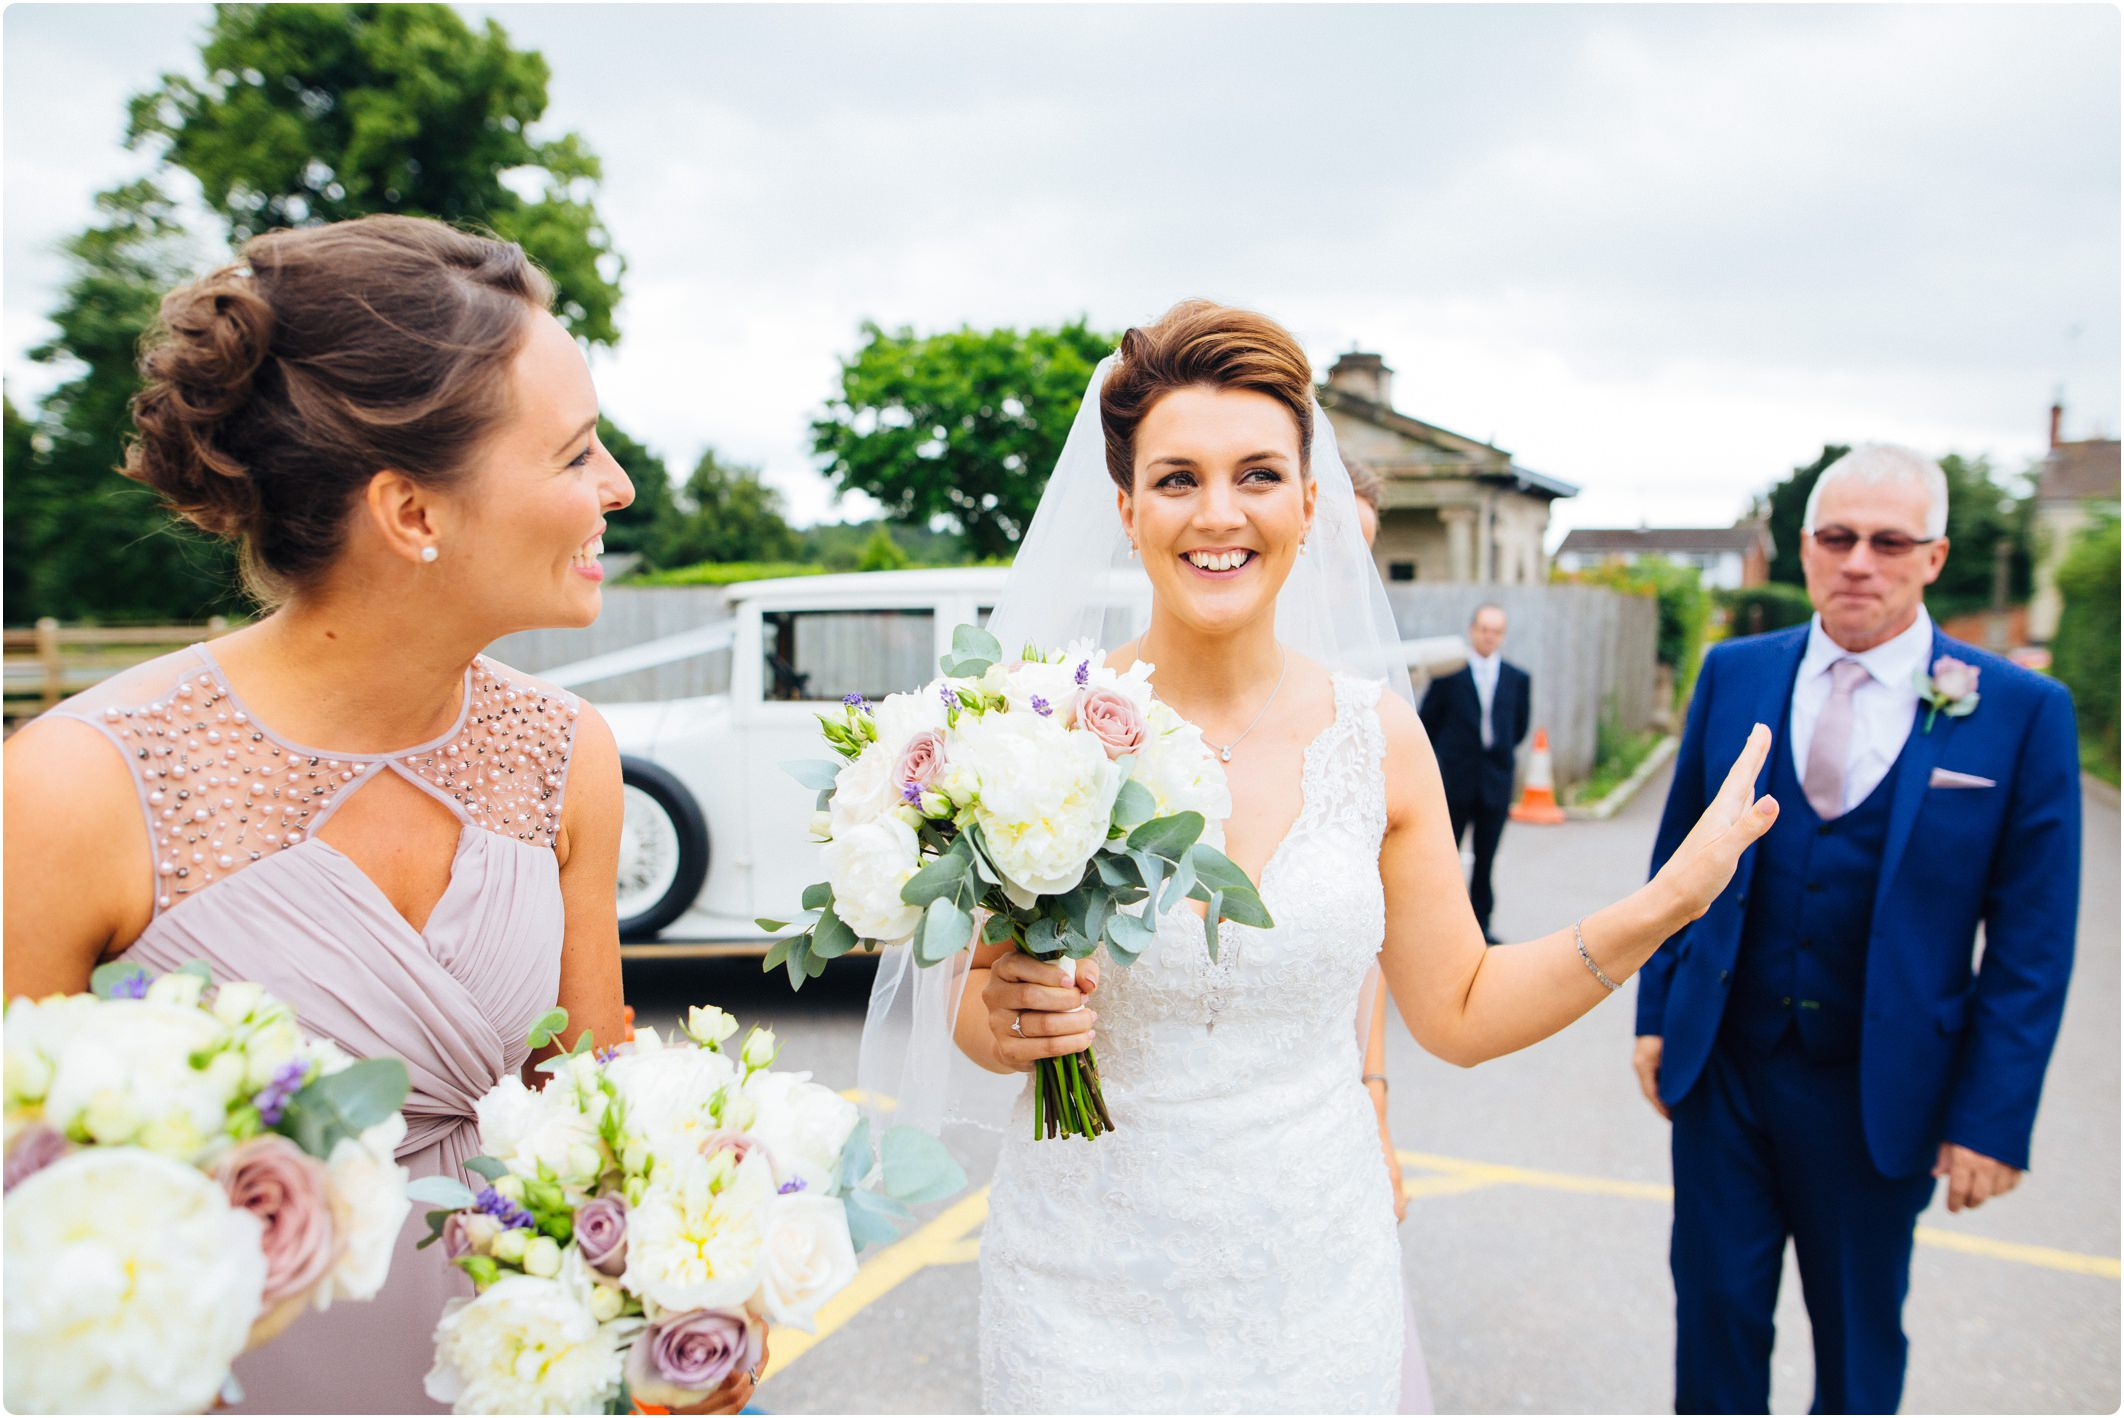 The moonraker wedding bride arriving at church